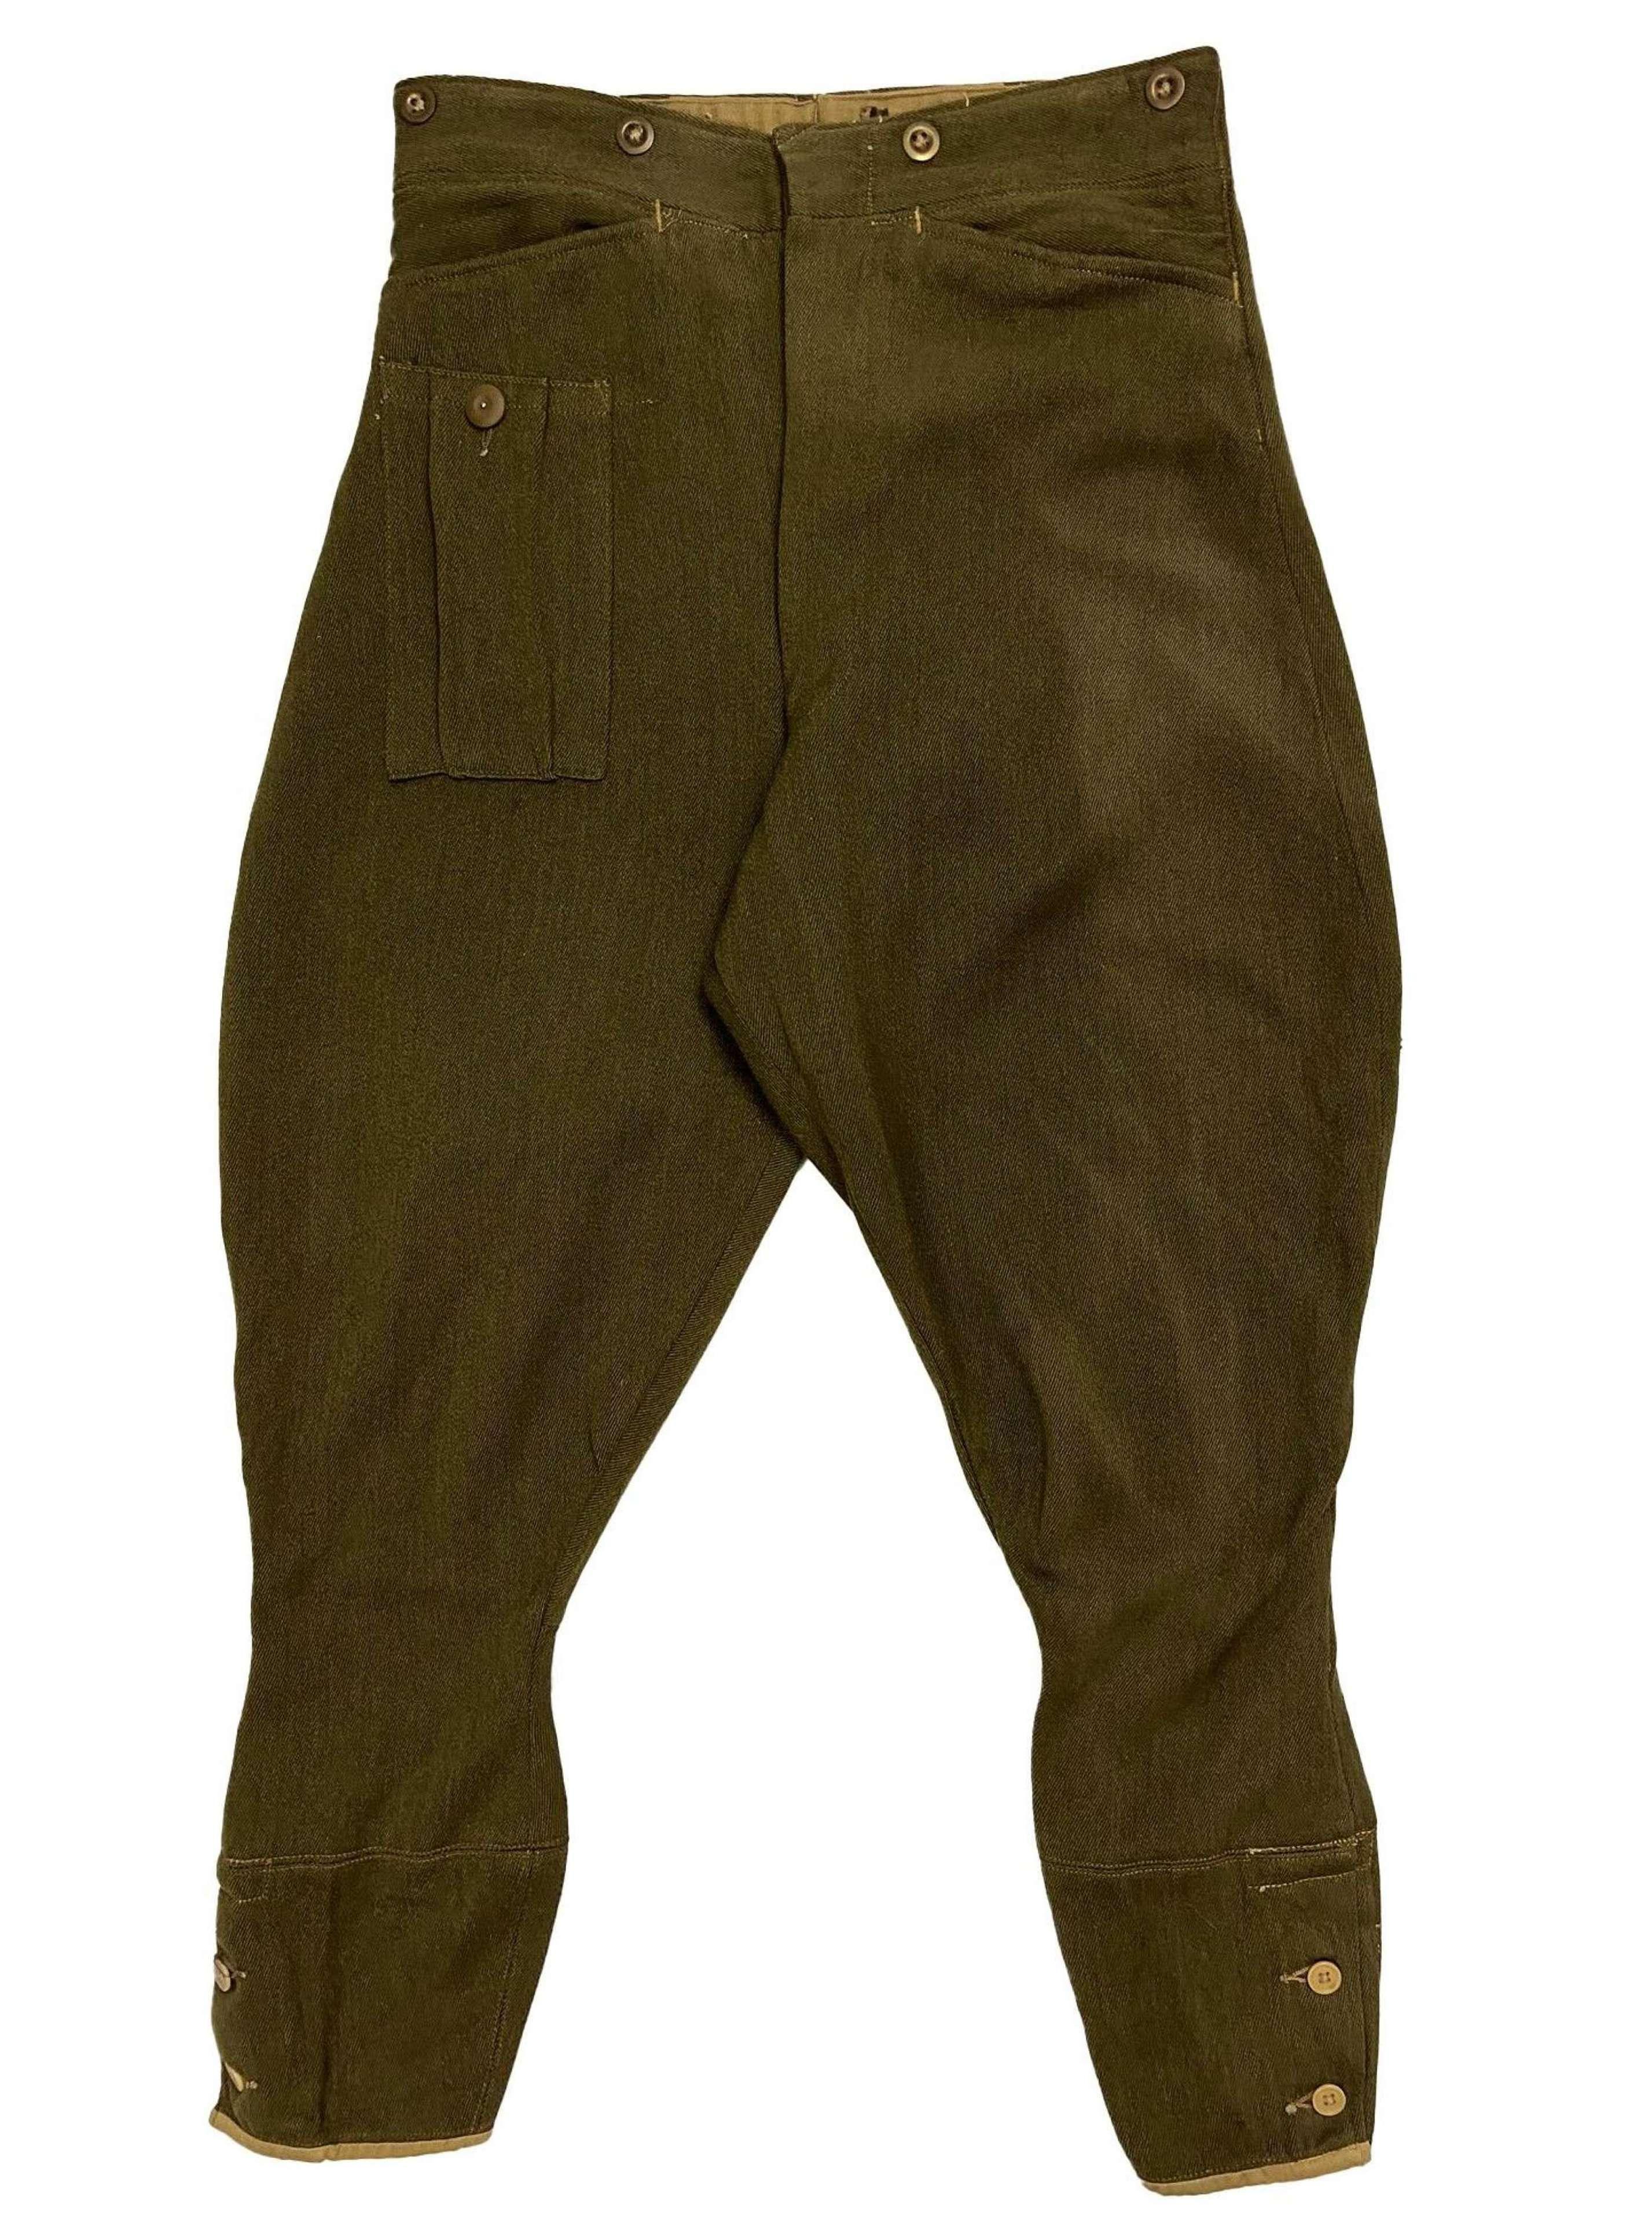 Original 1941 Dated British Army Dispatch Riders Breeches - Size 4